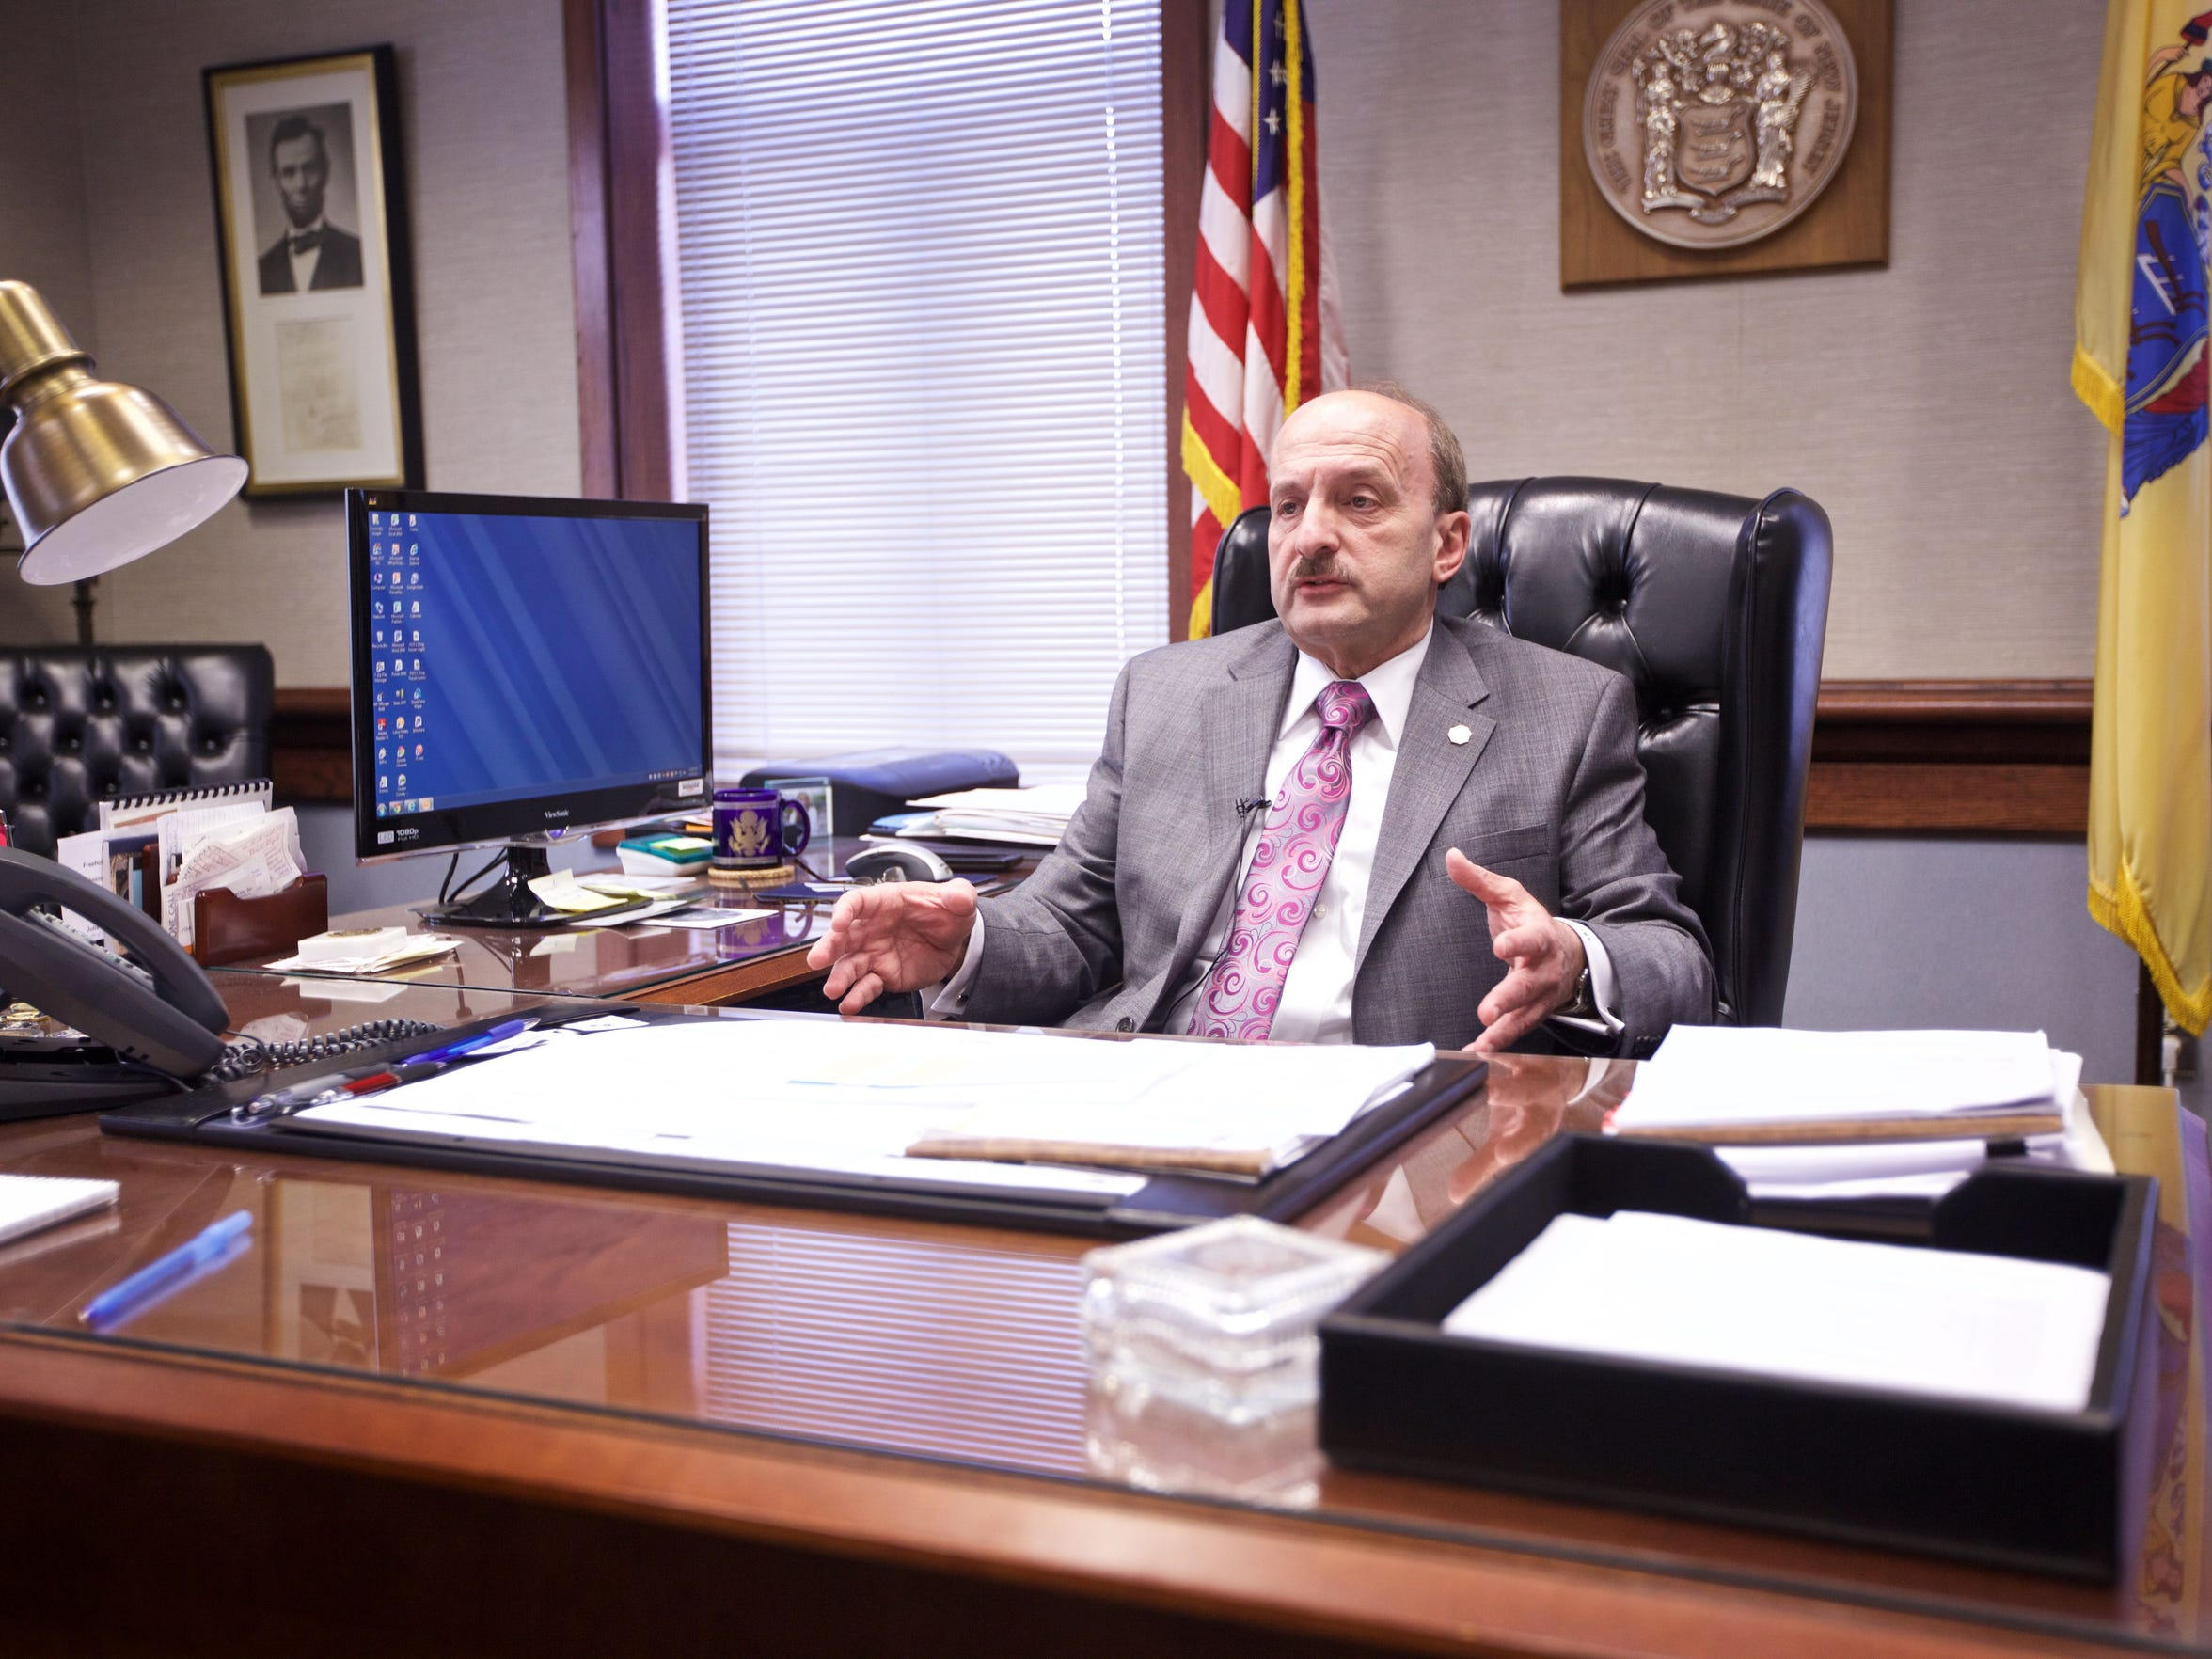 Prosecutor Joseph Coronato has rekindled the use of